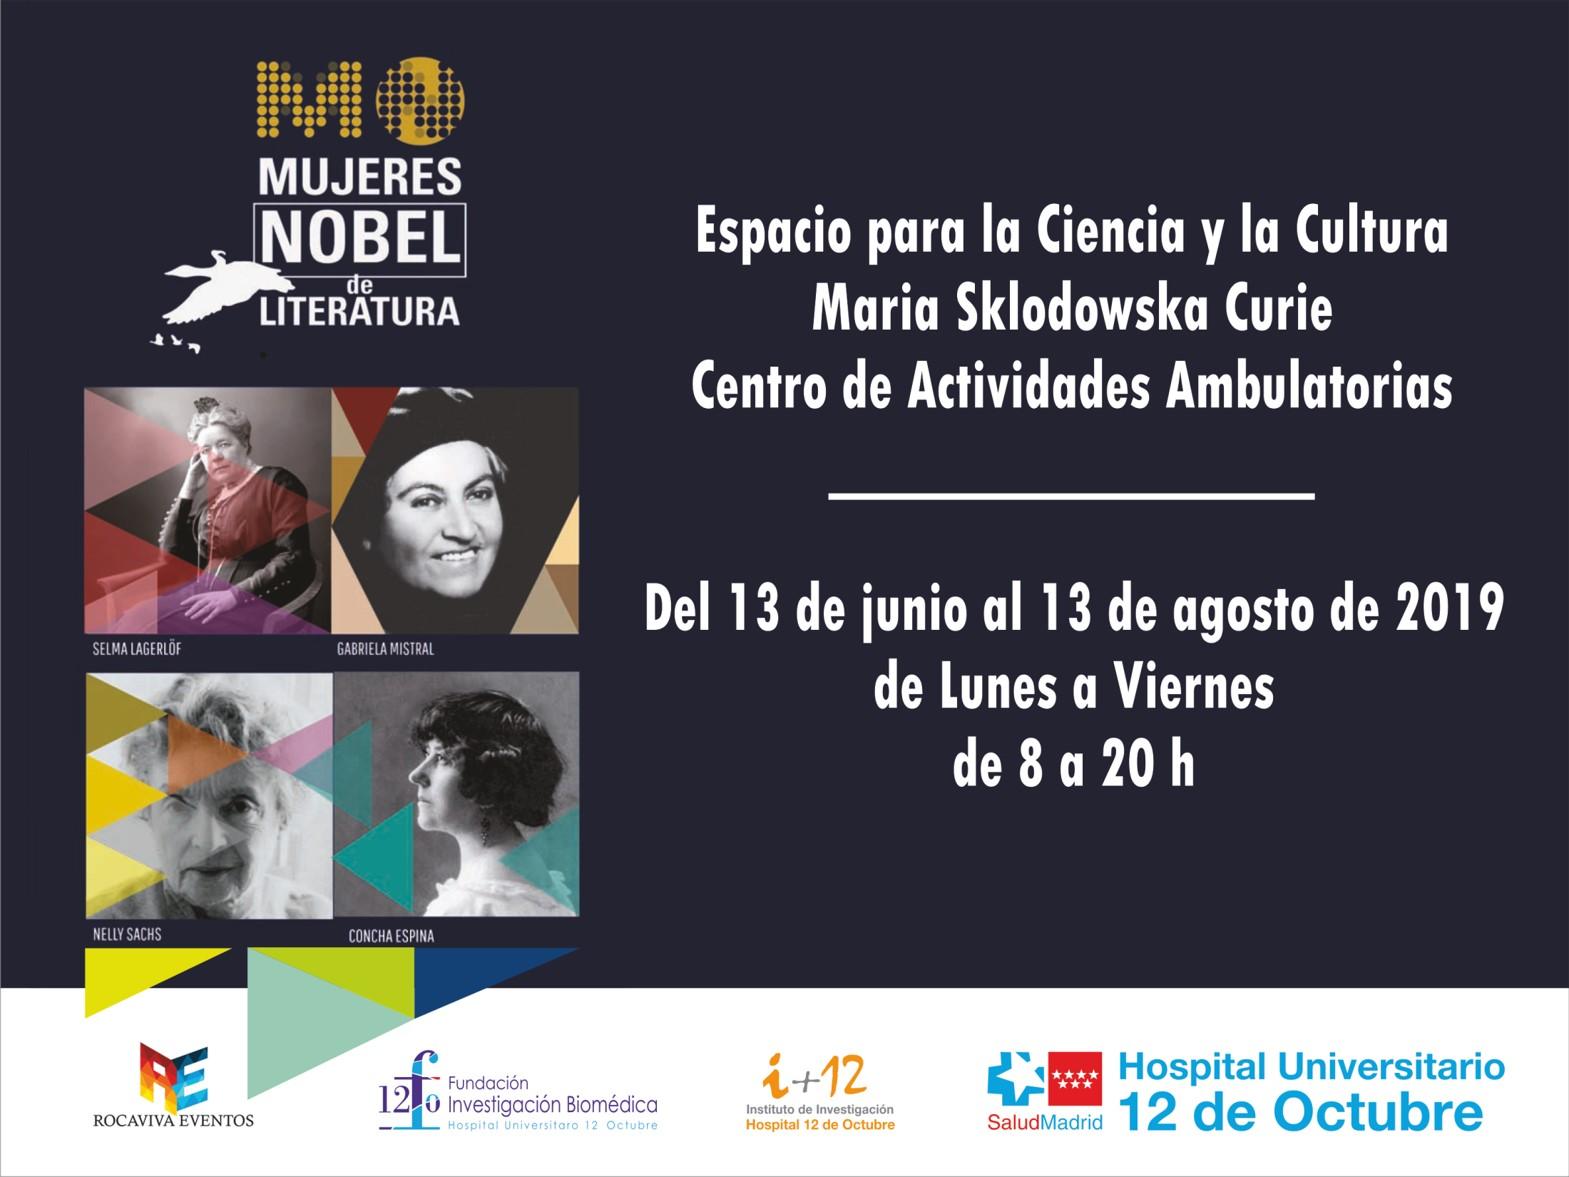 Mujeres Nobel de la Literatura visitan el Hospital 12 de Octubre.